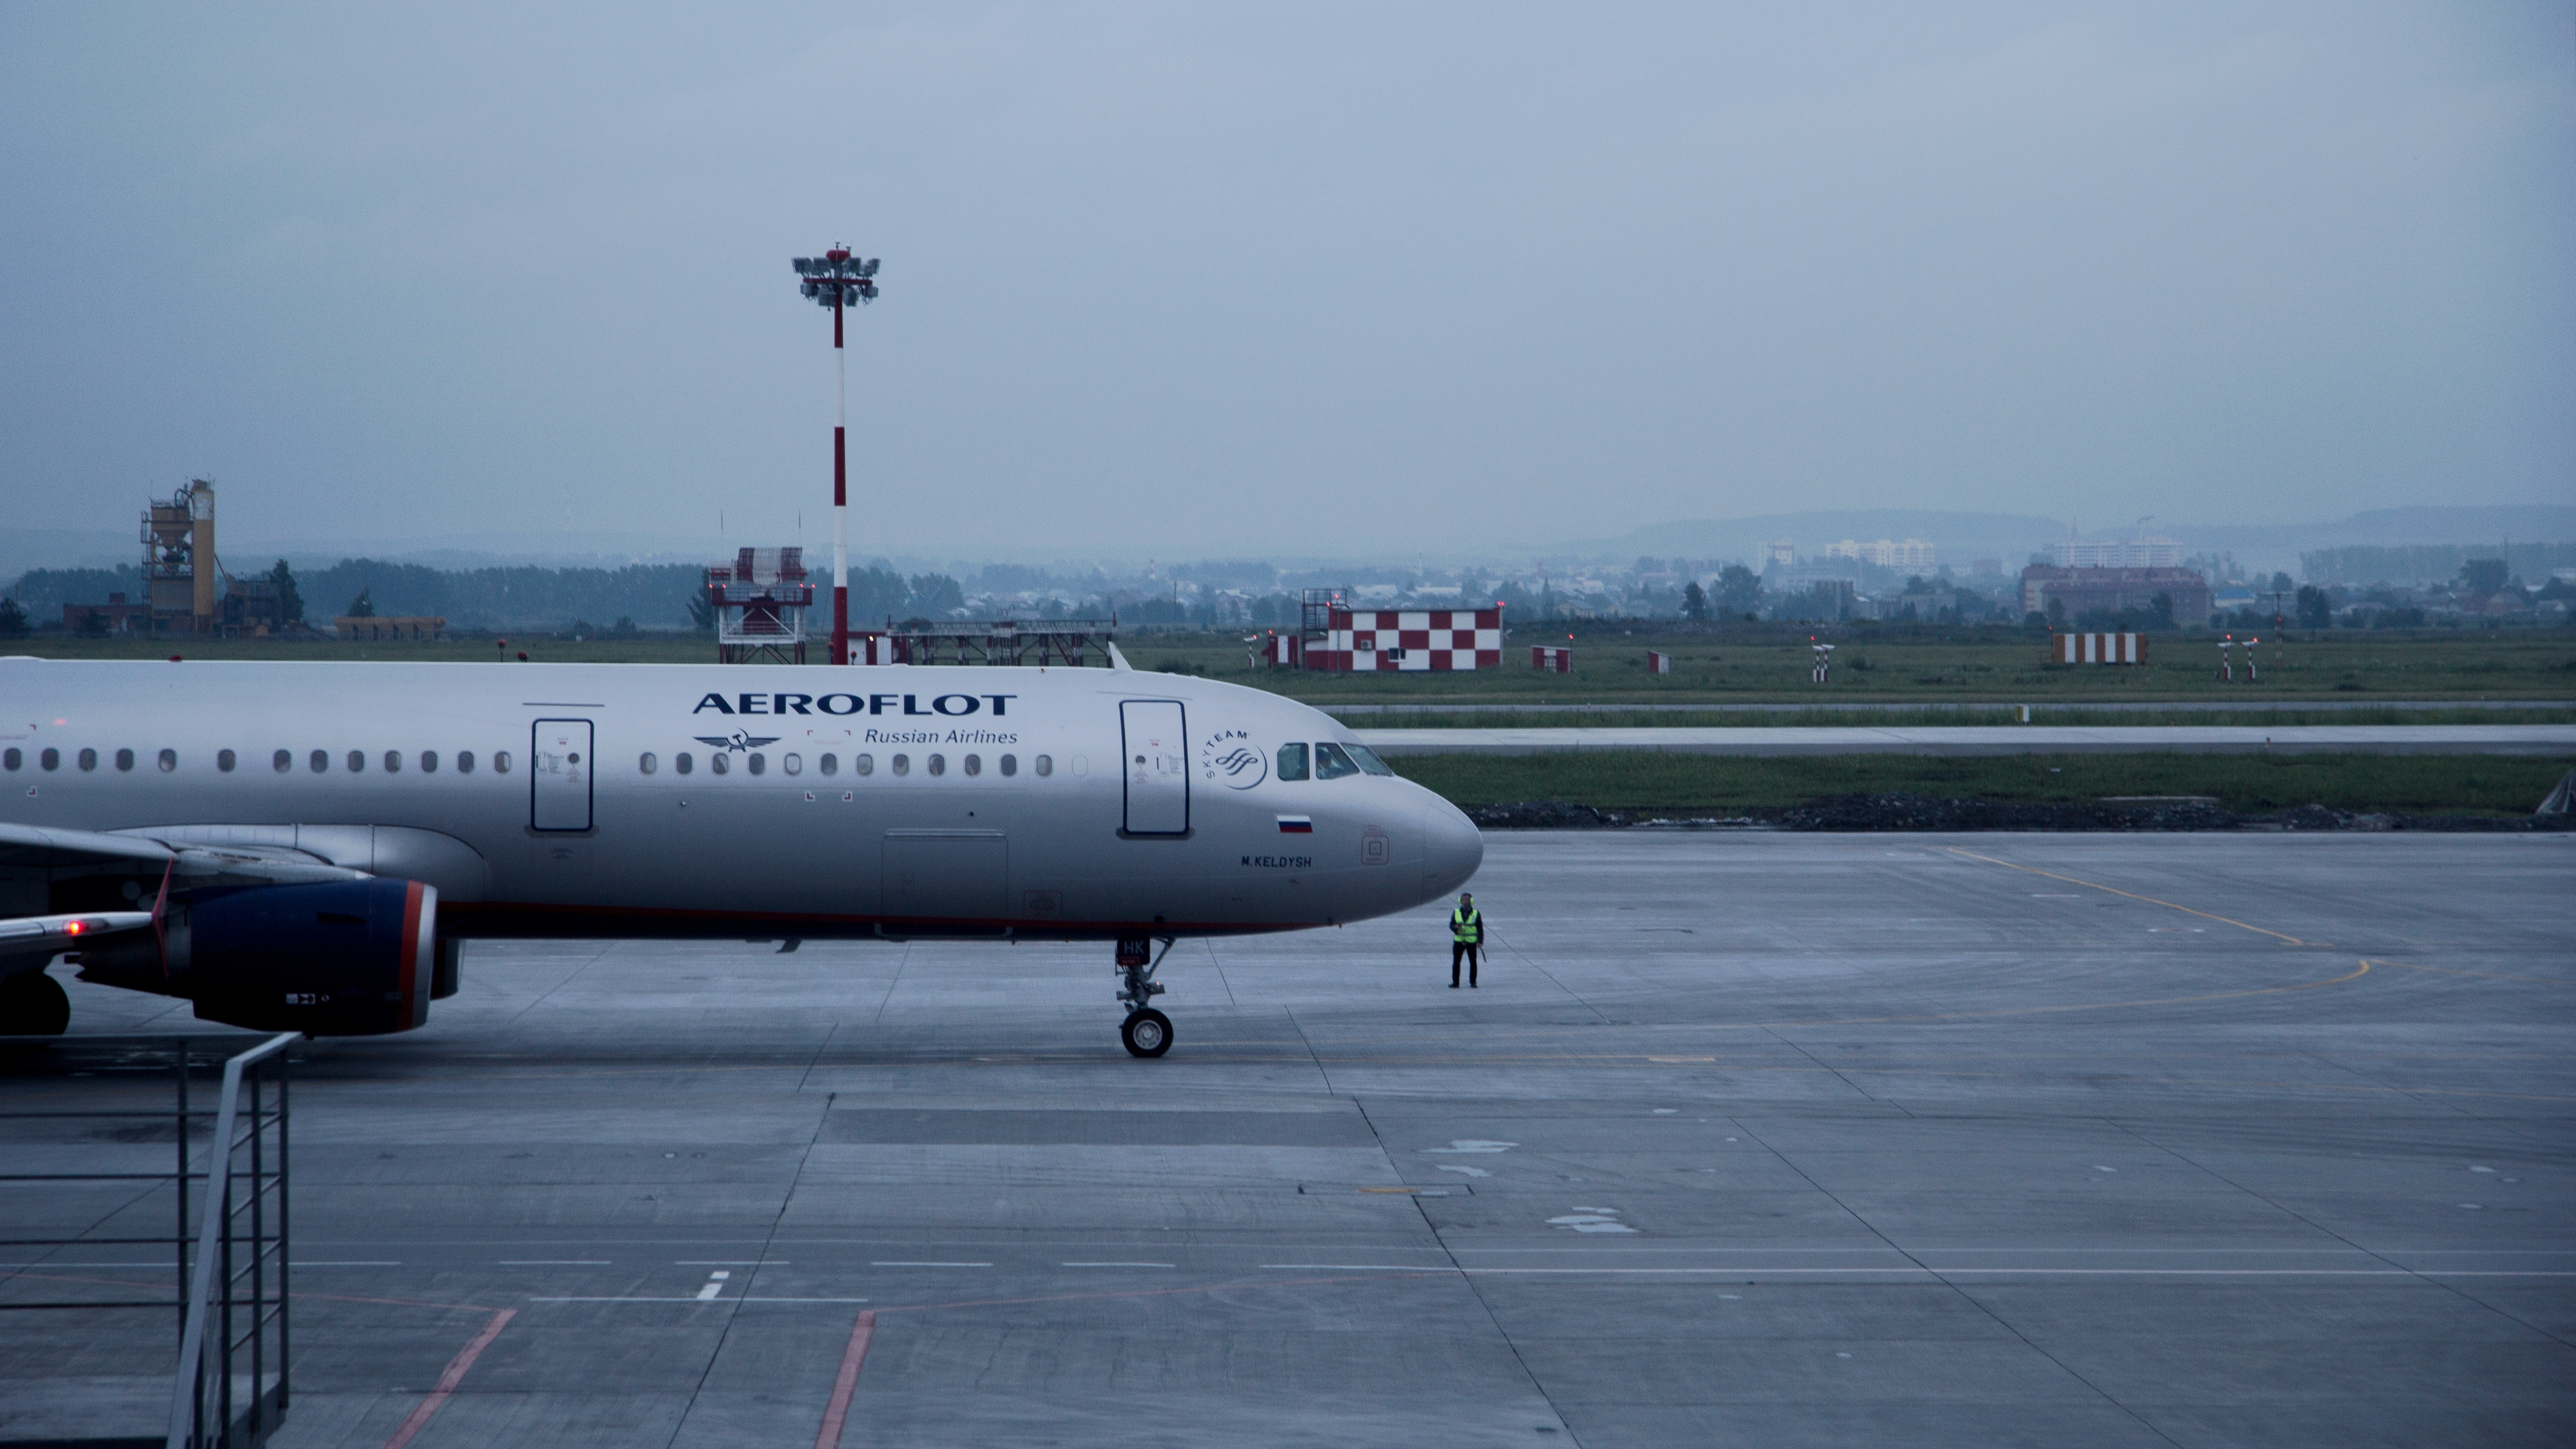 White aeroflot passenger plane on airport photo